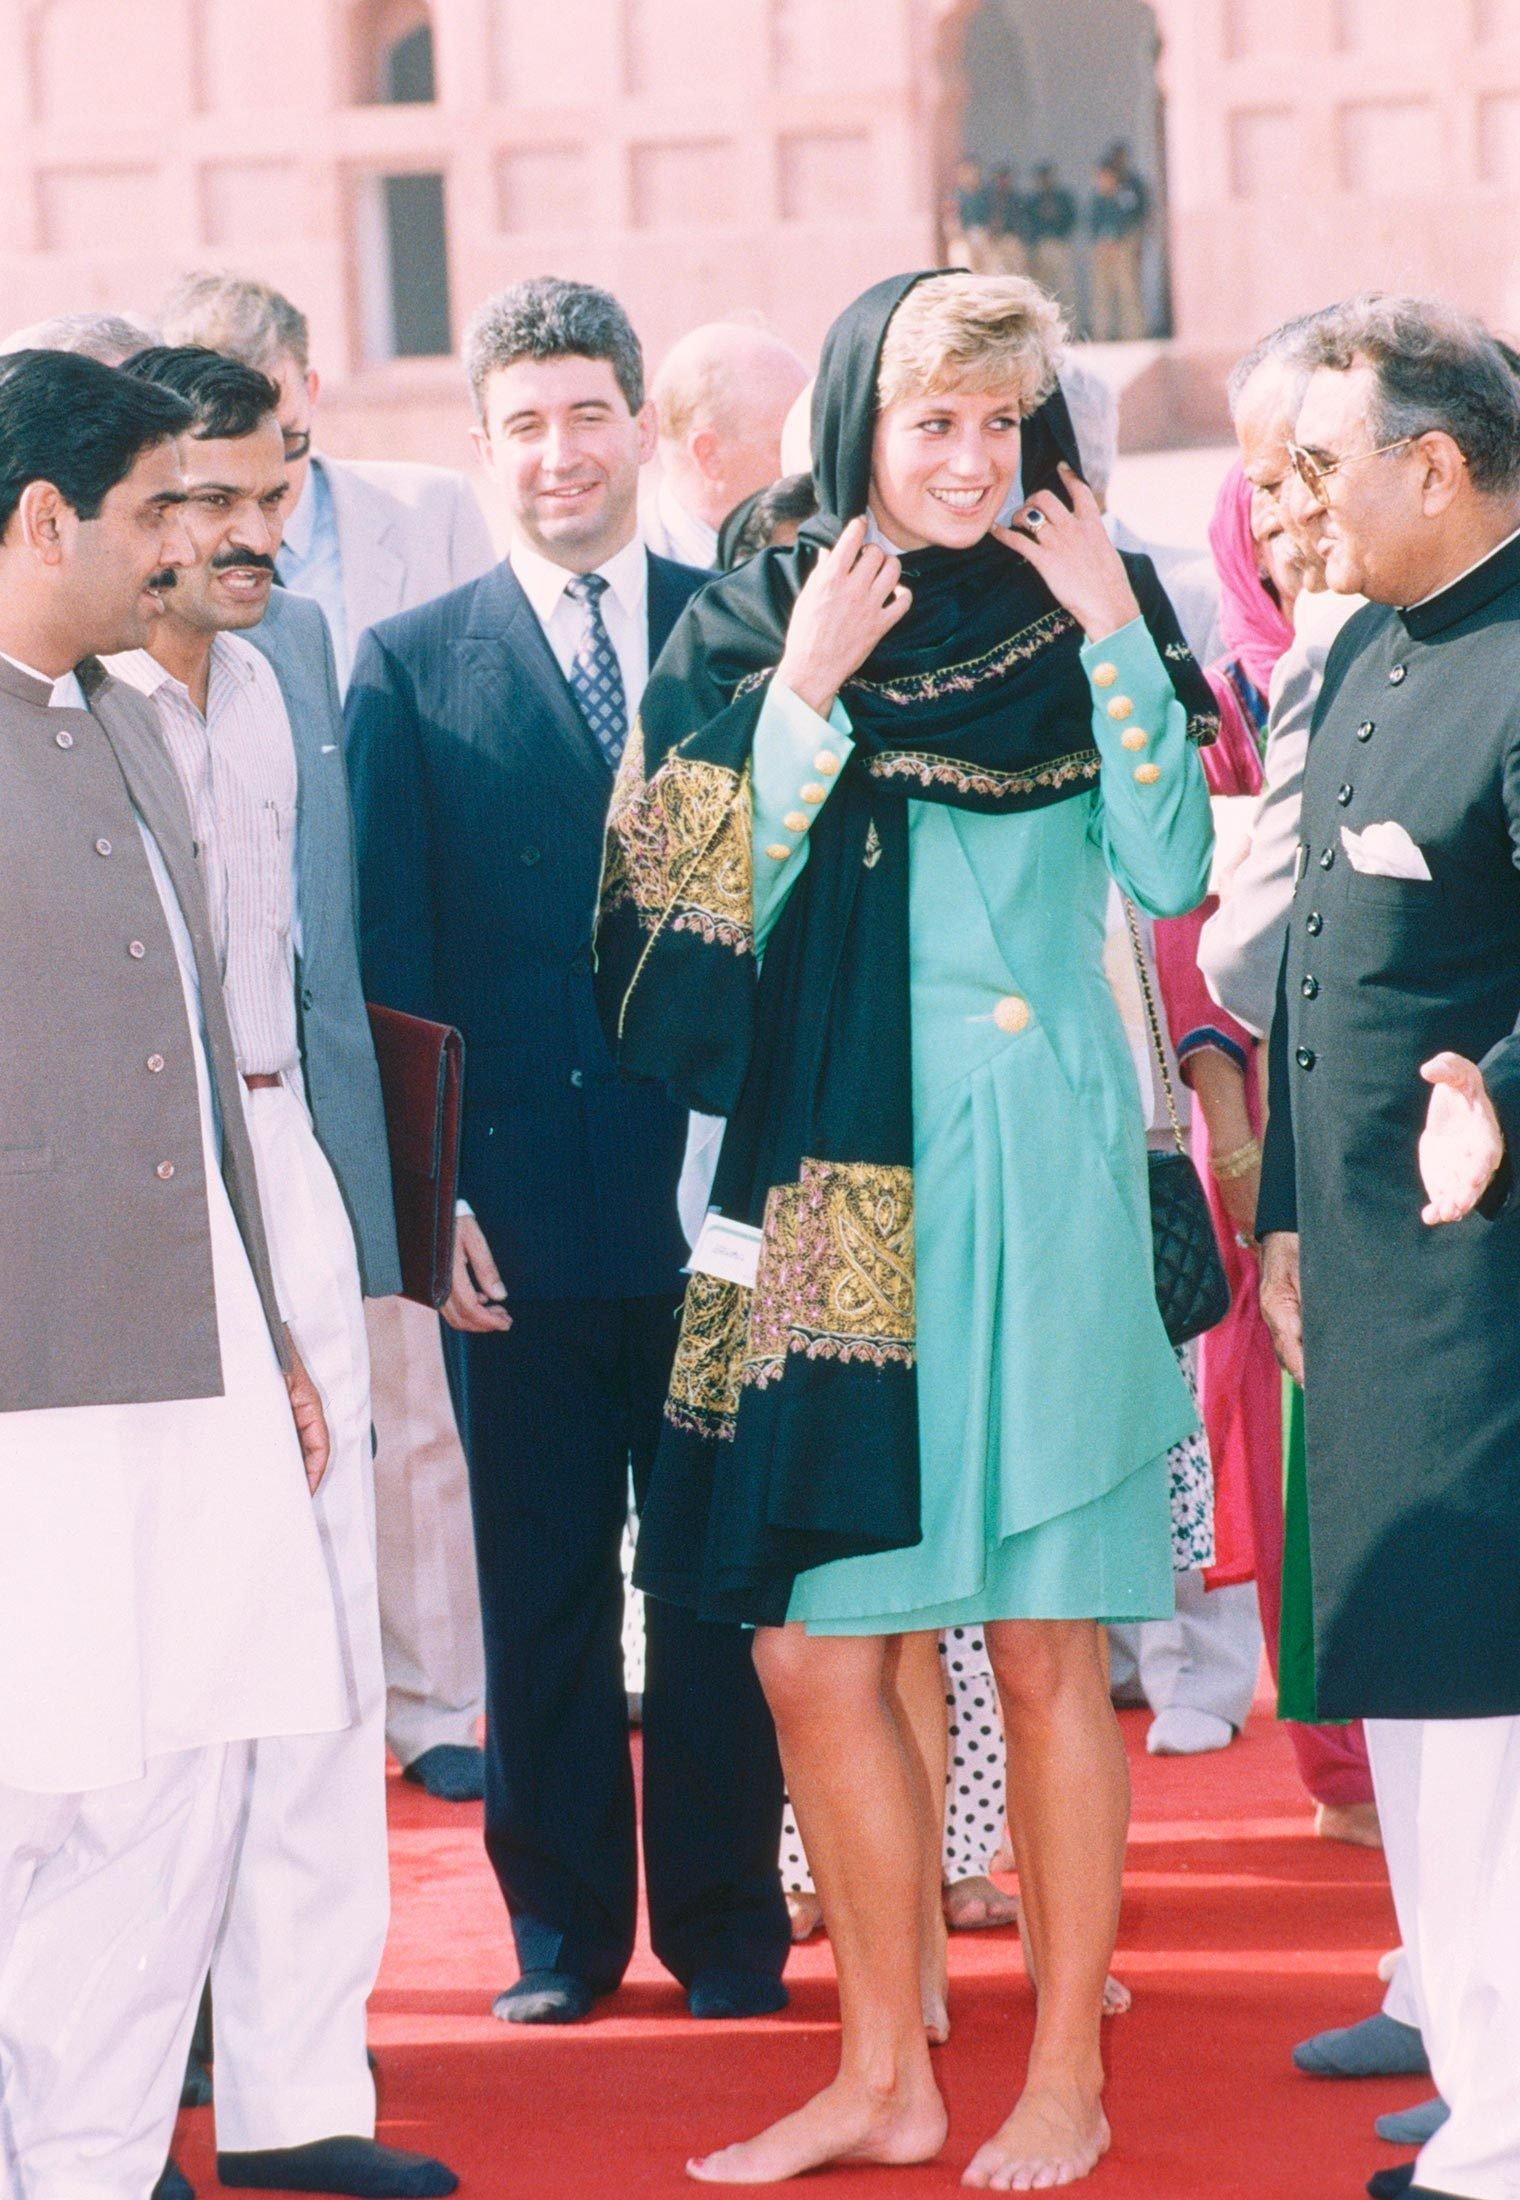 Secrets About Princess Diana S Affair With Hasnat Khan Reader S Digest